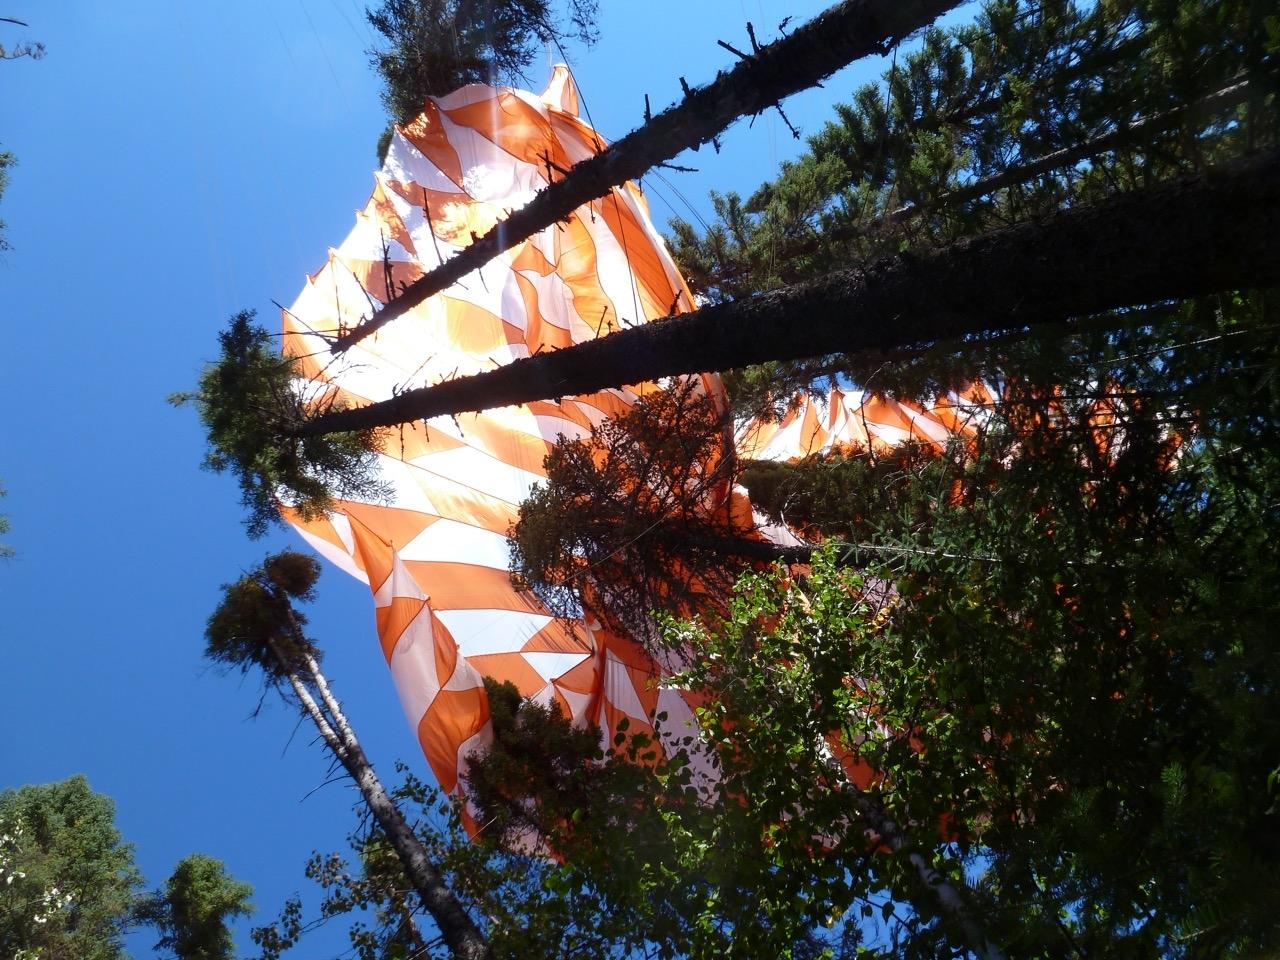 parachute_canopee.jpg